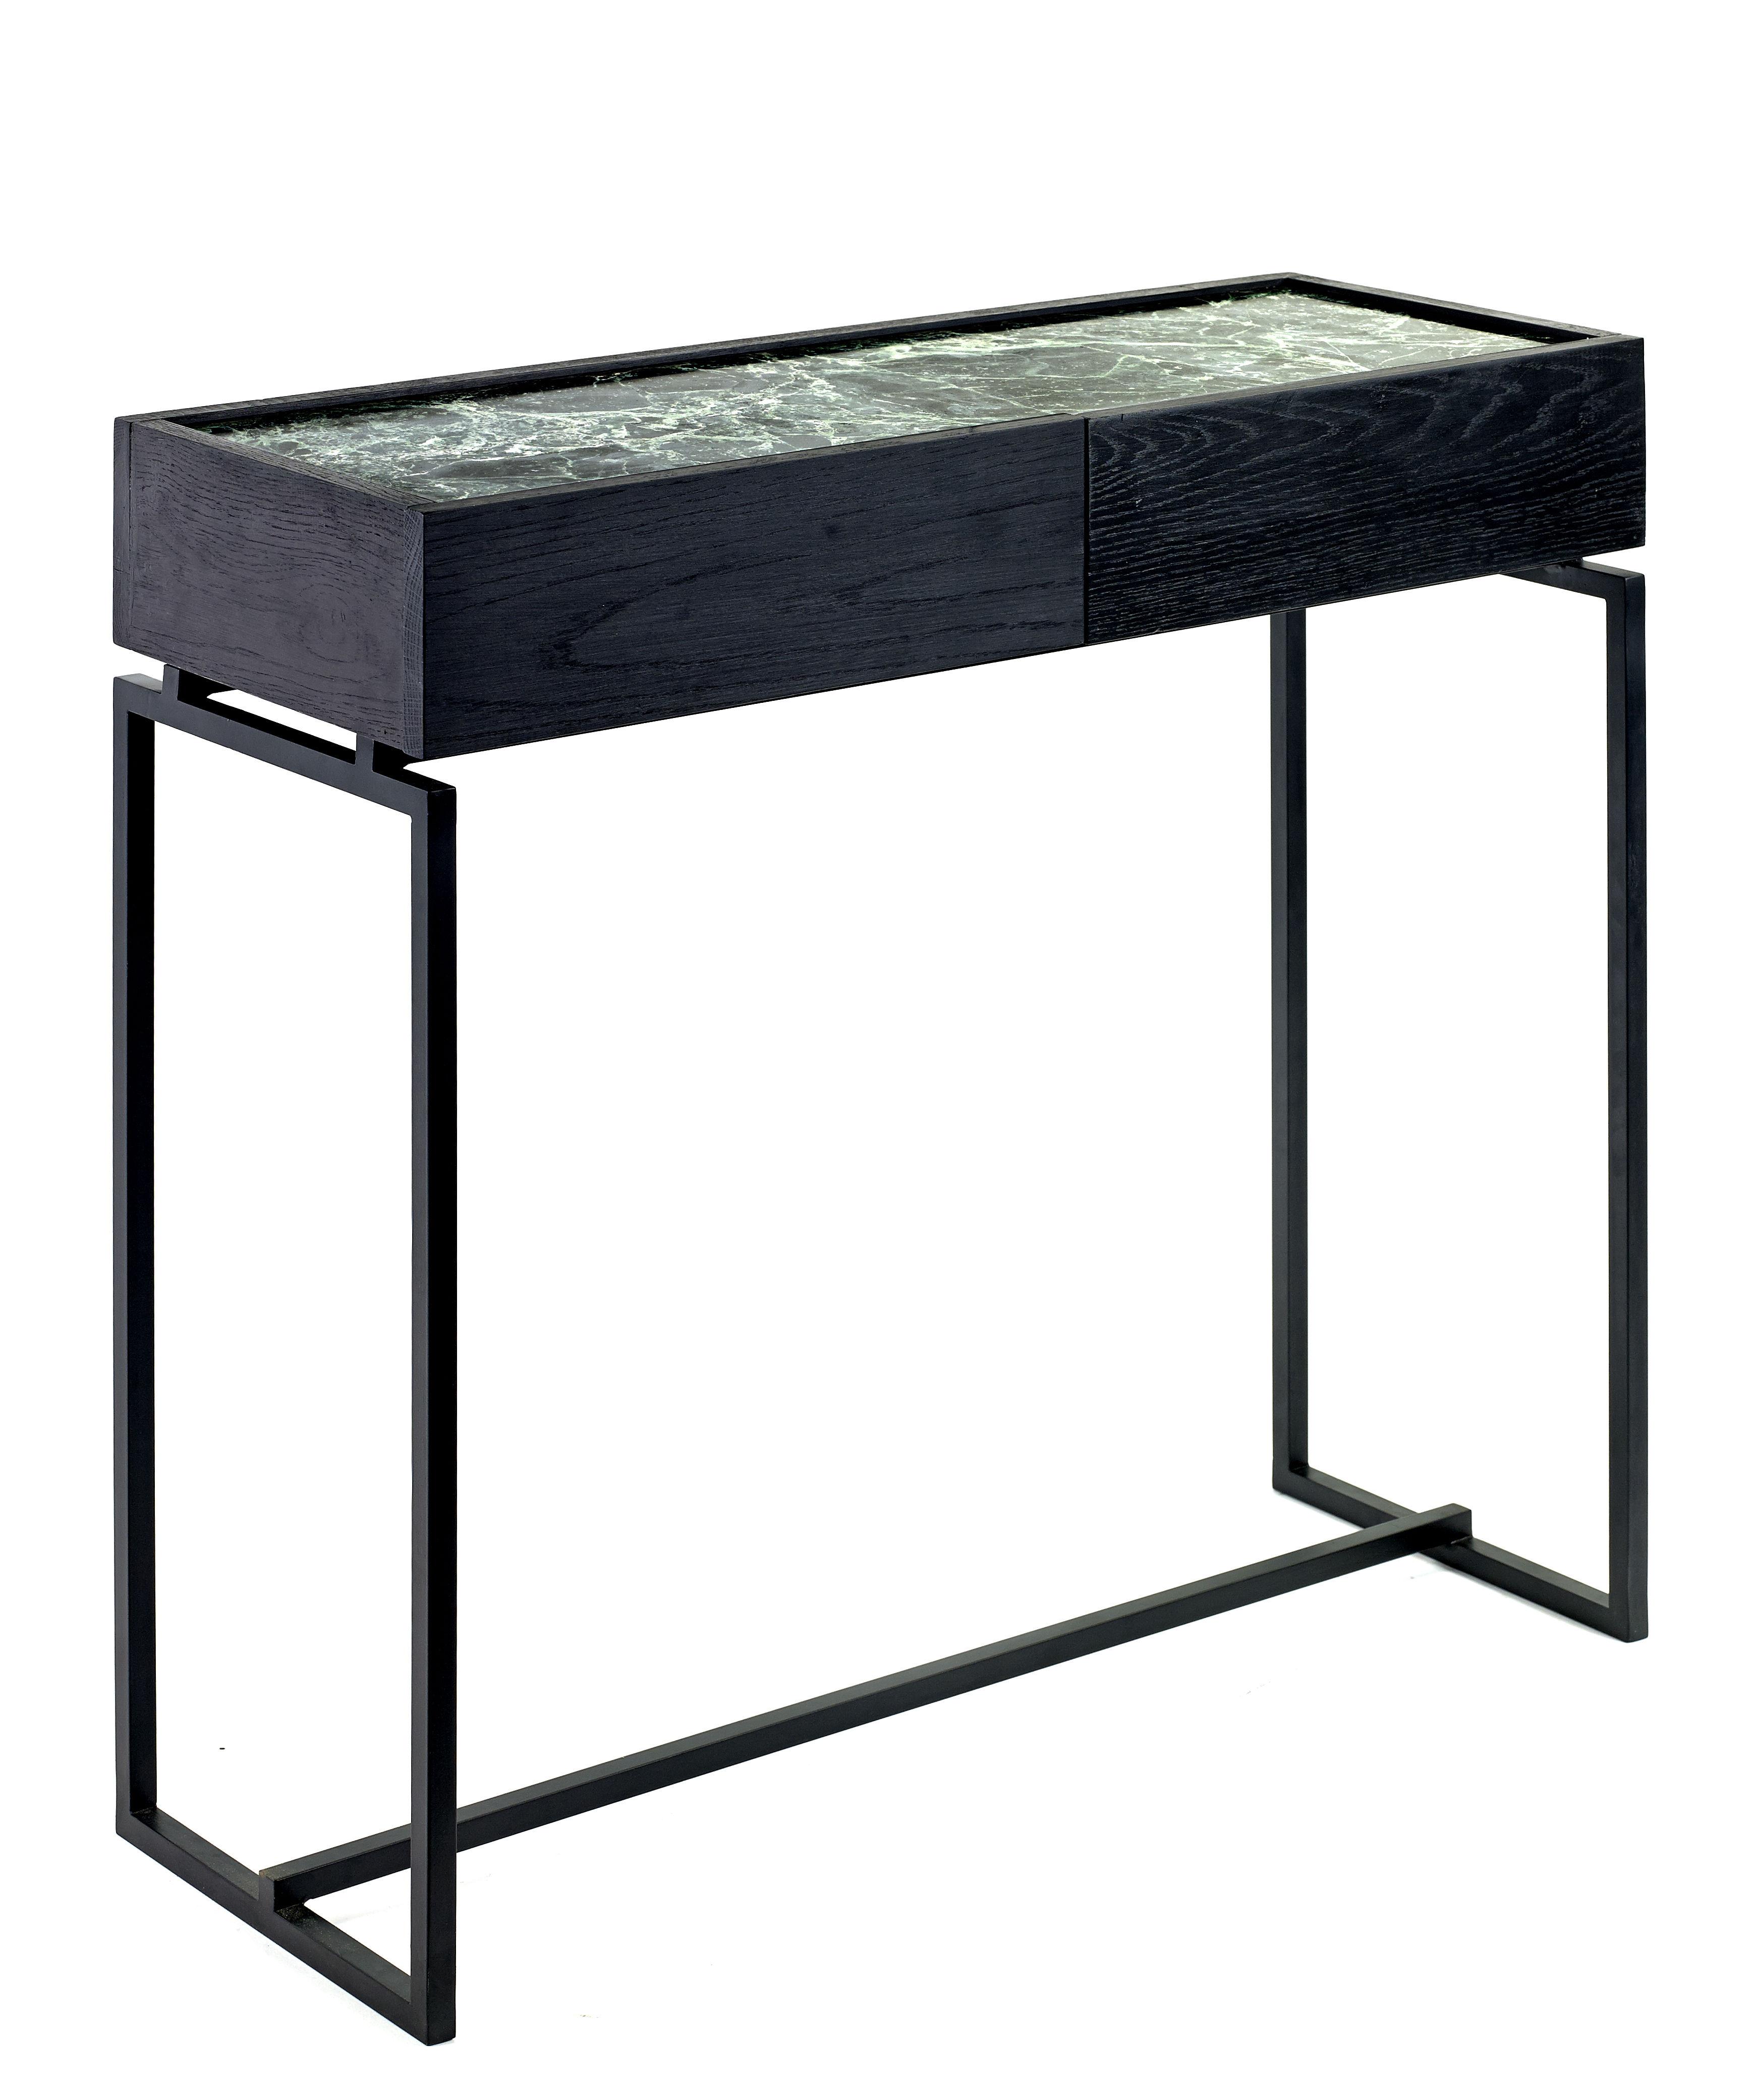 Möbel - Konsole - Verde Konsole / mit 1 Schublade - Marmor - L 80 cm - Serax - Grüner Marmor / Fußgestell schwarz - bemaltes Holz, Marmor, Metall